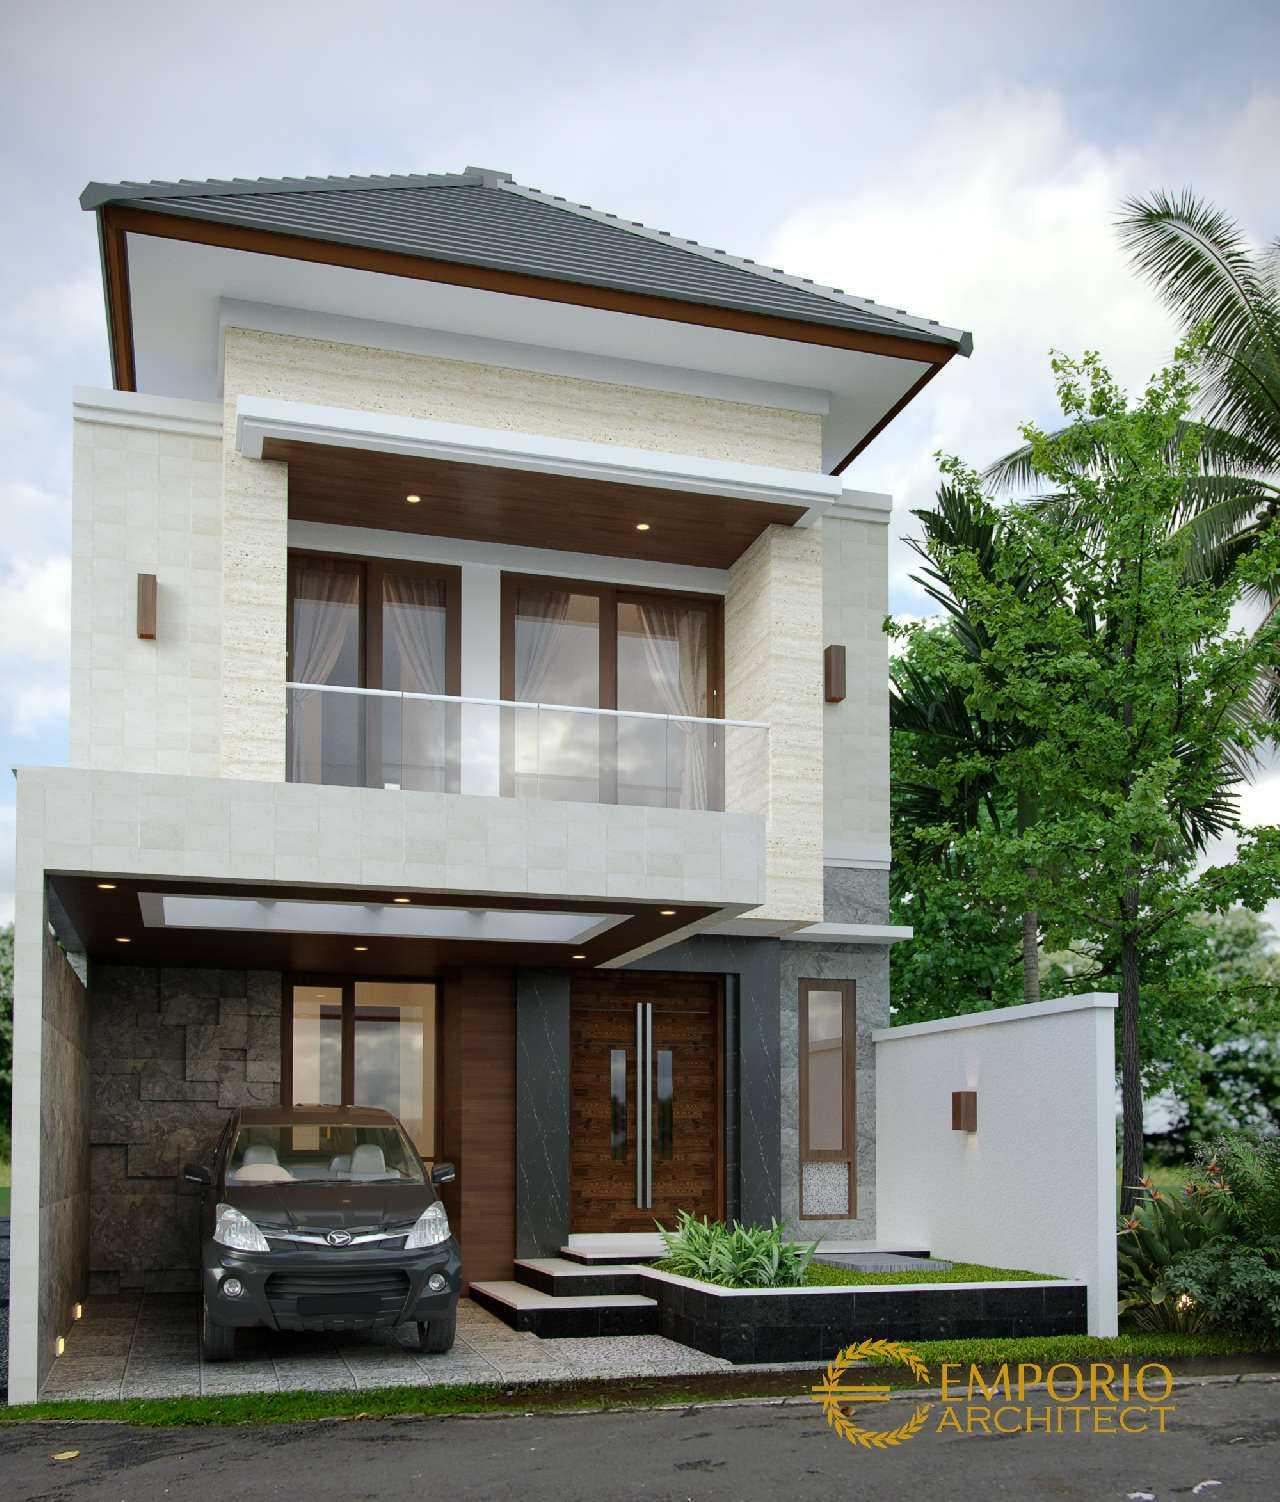 Emporio Architect Jasa Arsitek Badung Desain Rumah Modern 2 Lantai 765 @ Badung, Bali Kabupaten Badung, Bali, Indonesia Kabupaten Badung, Bali, Indonesia Emporio-Architect-Jasa-Arsitek-Badung-Desain-Rumah-Modern-2-Lantai-765-Badung-Bali Modern 87392